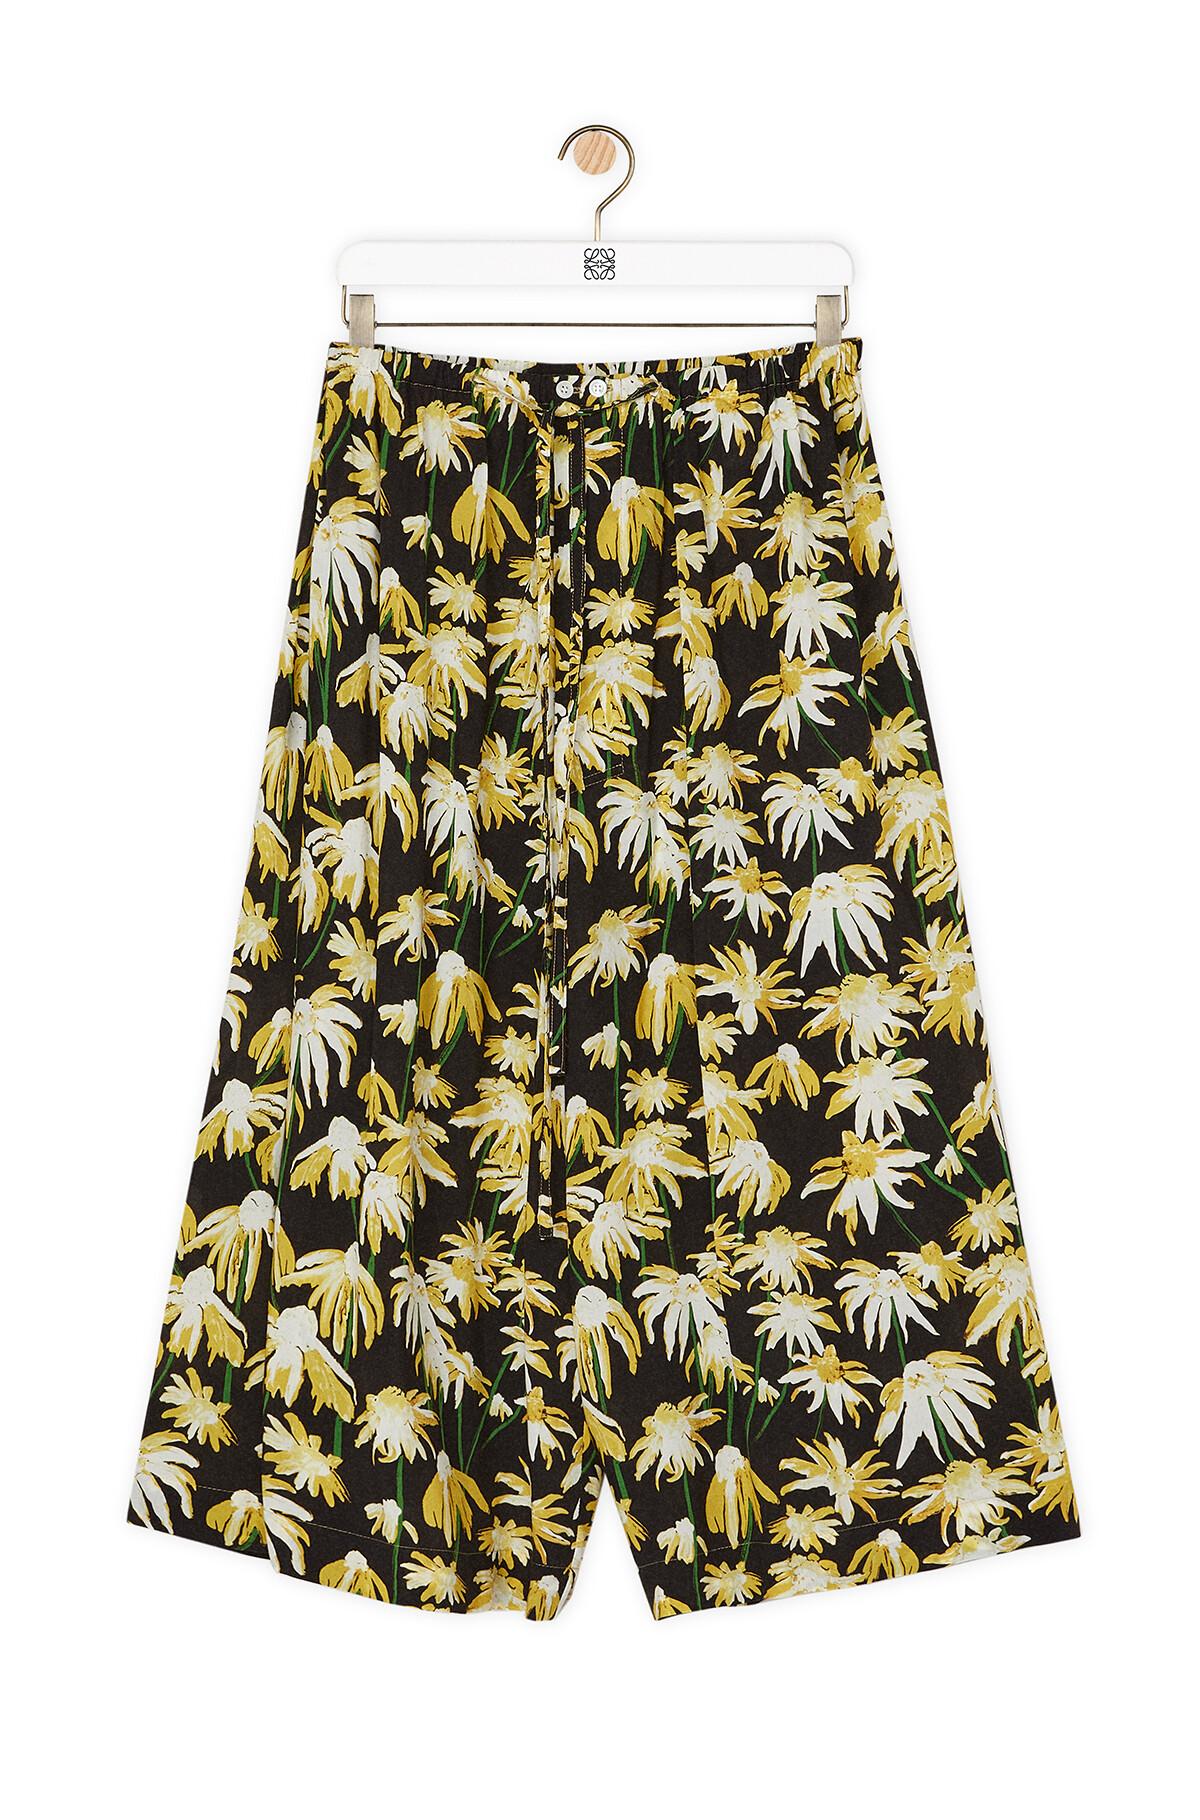 LOEWE Daisy Print Drawstring Shorts Black/Yellow front